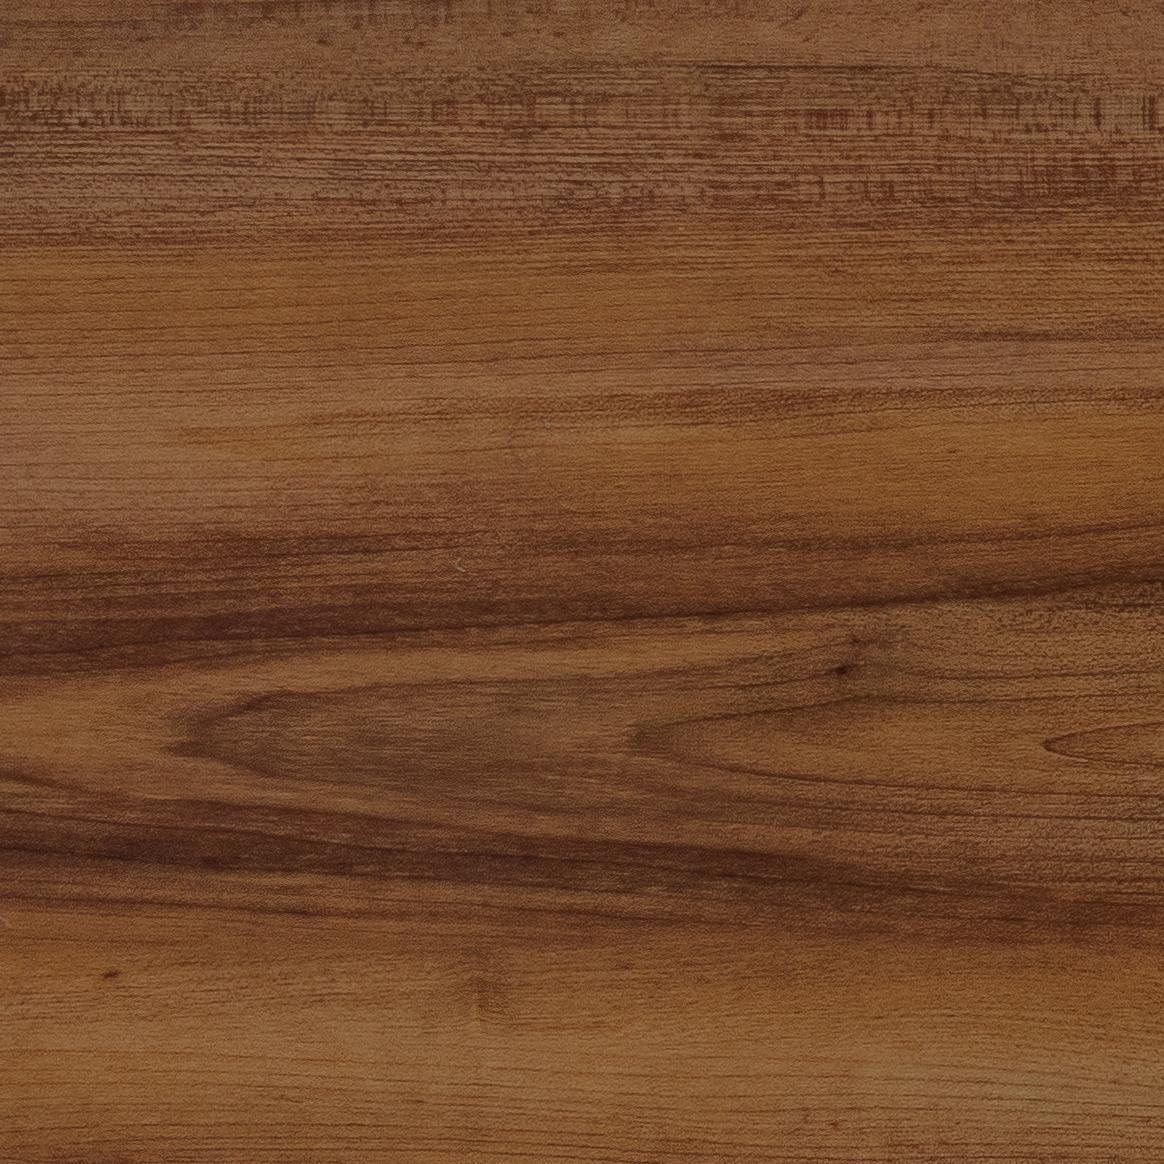 Harvest Walnut tile